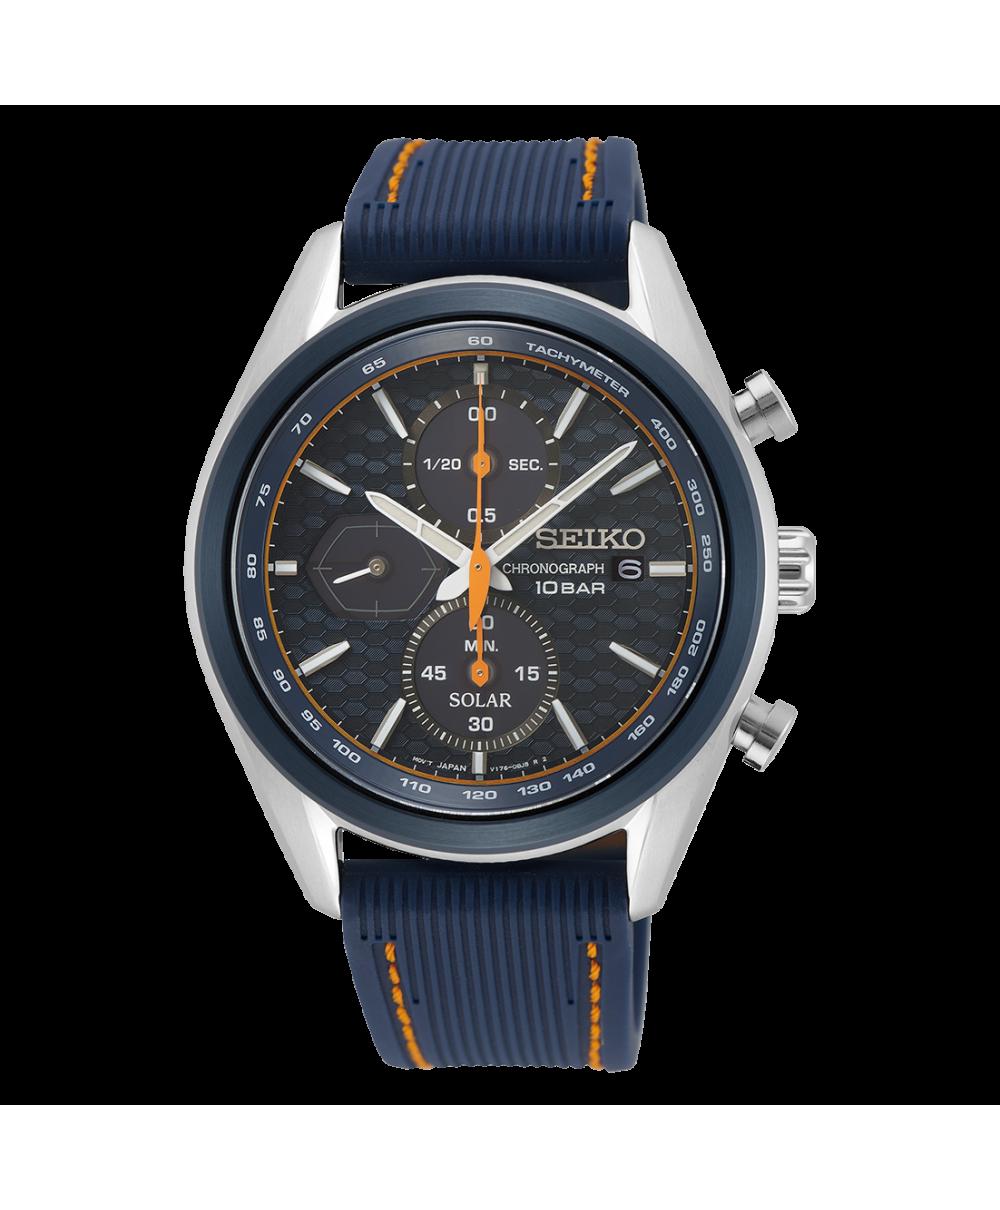 Reloj Seiko Solar Prospex Machina Sportiva SSC775P1